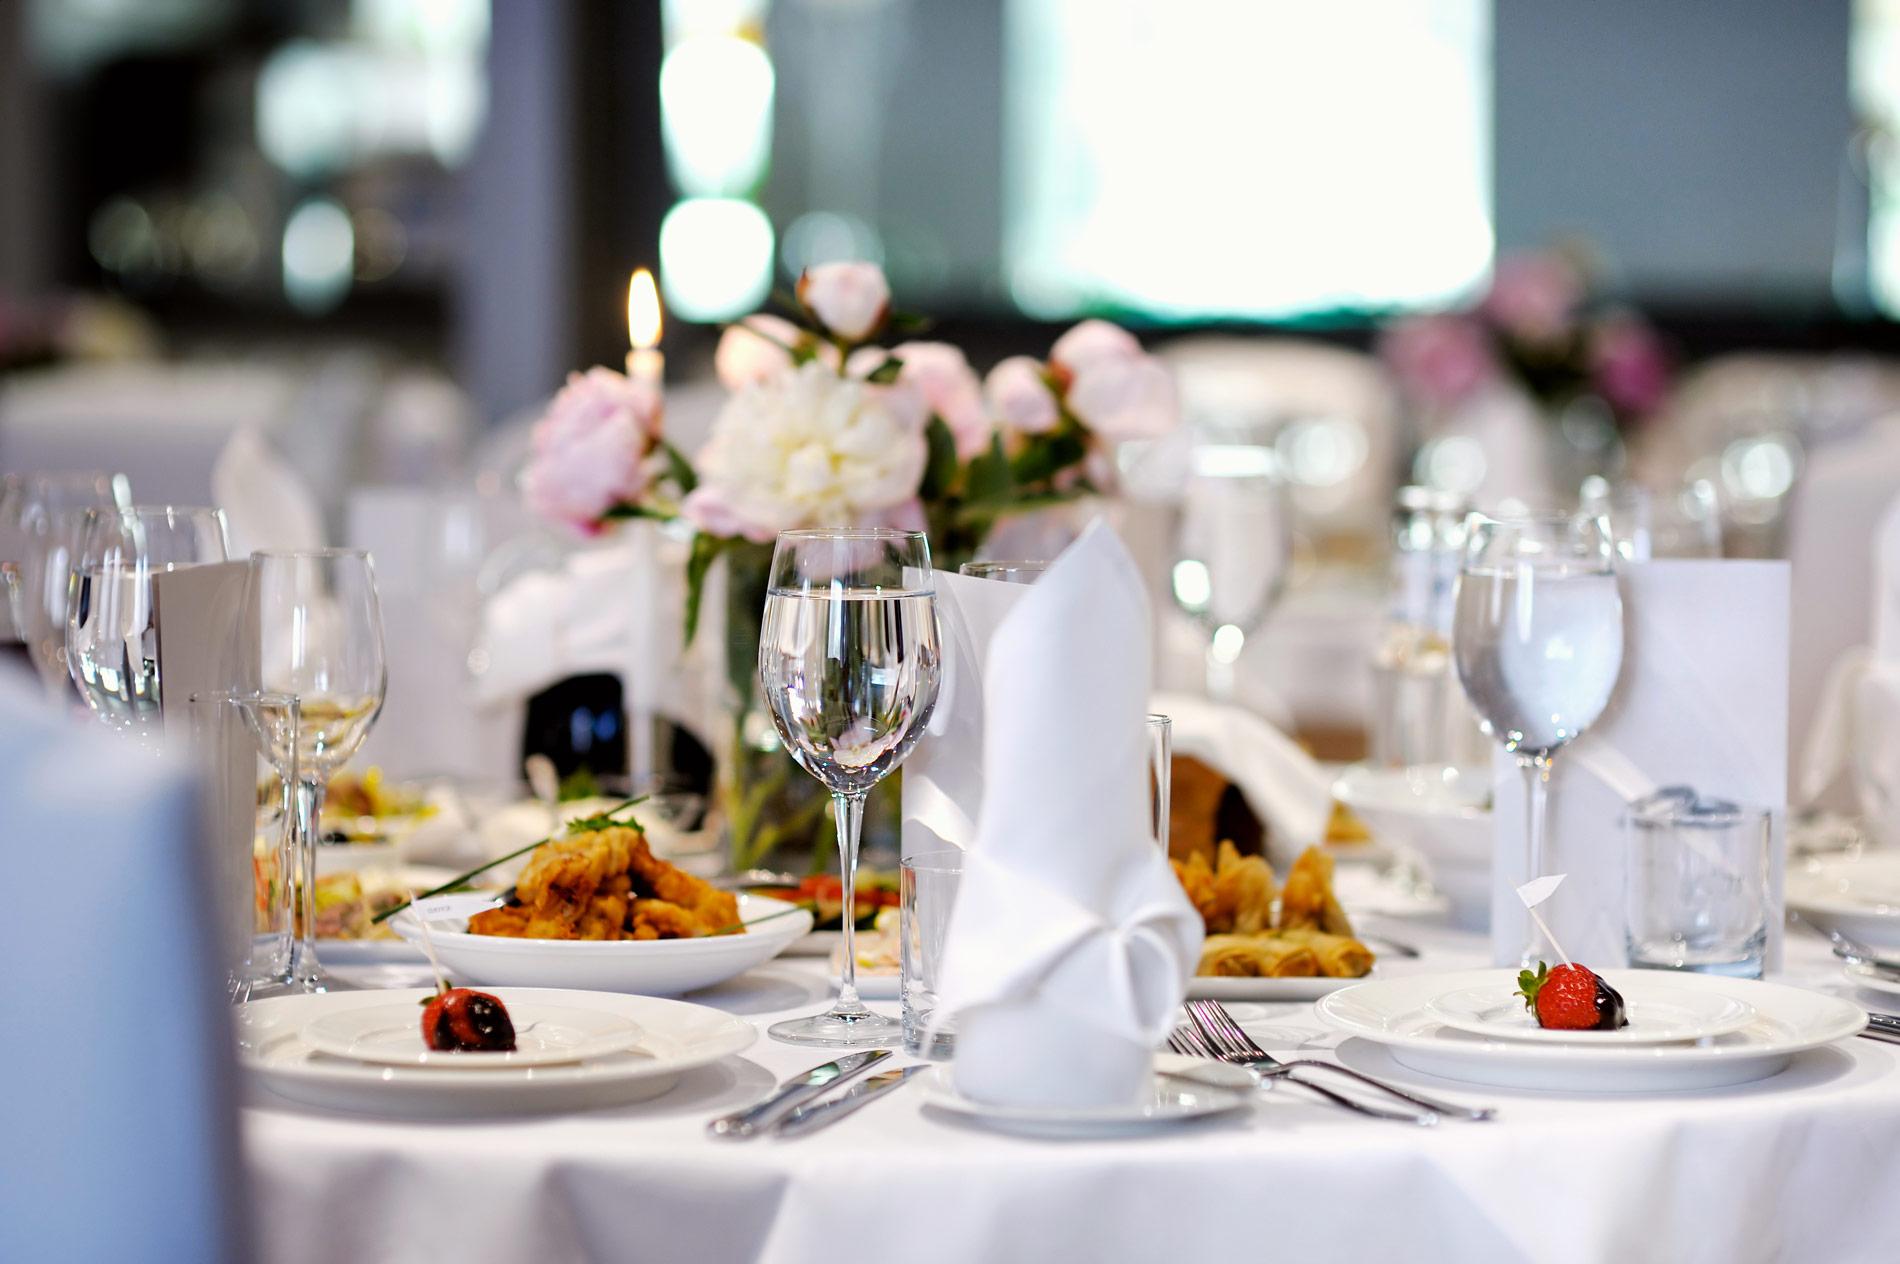 Eventi   Gourmet in Movimento   Catering Ischia